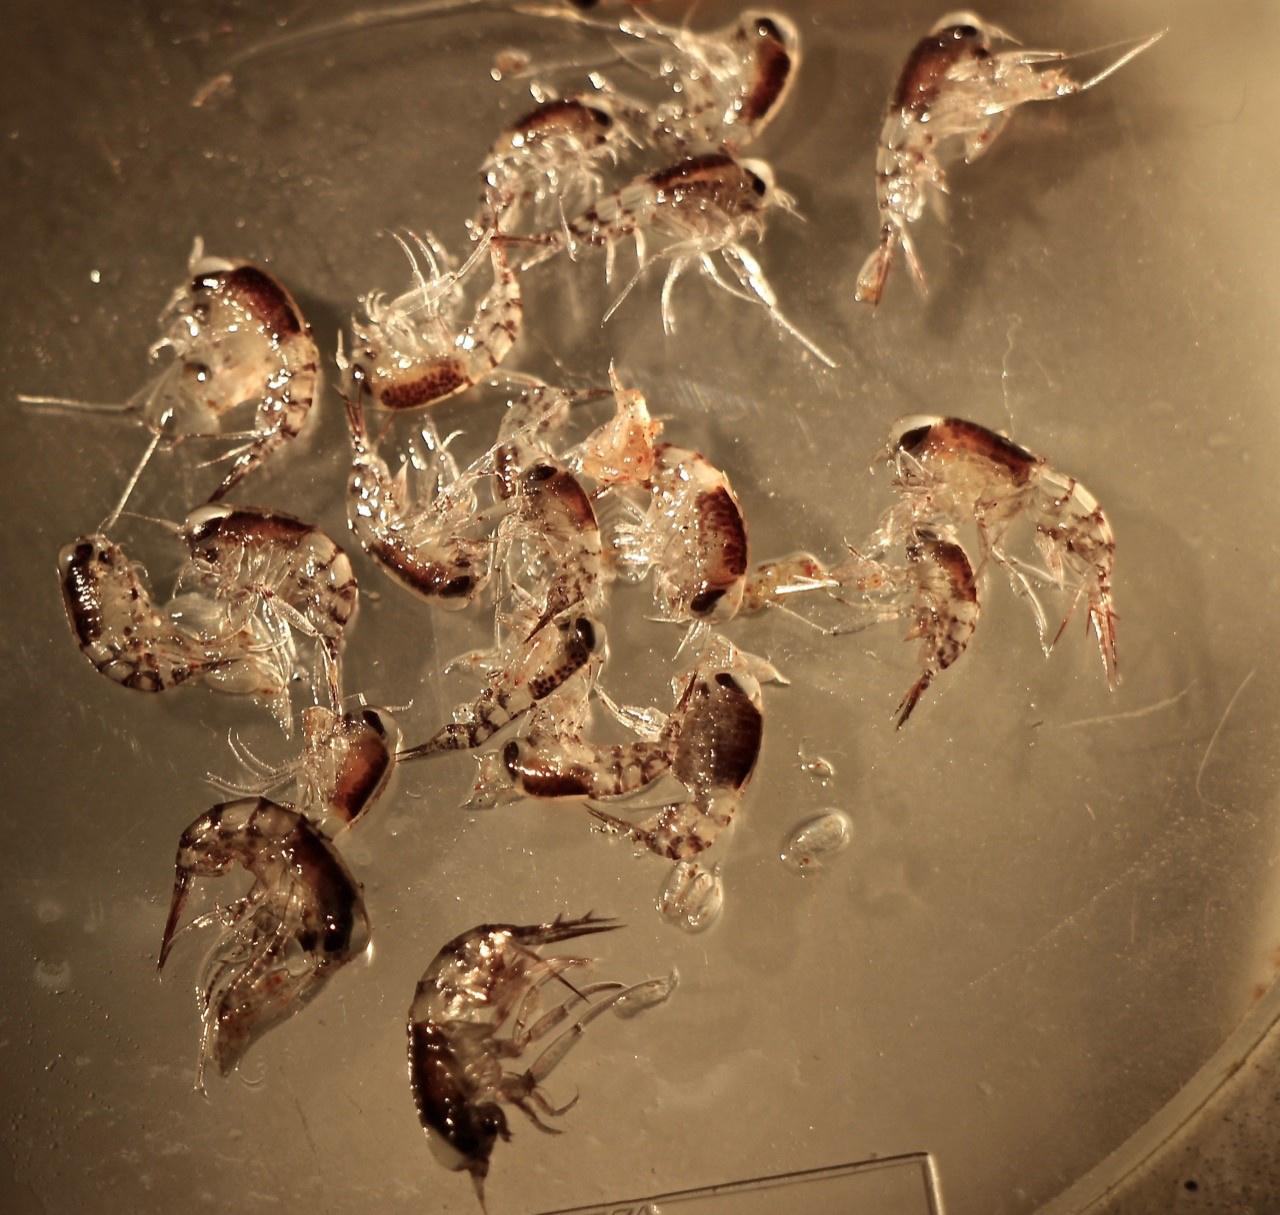 pelagic-amphipods-ecomon-walsh.jpg